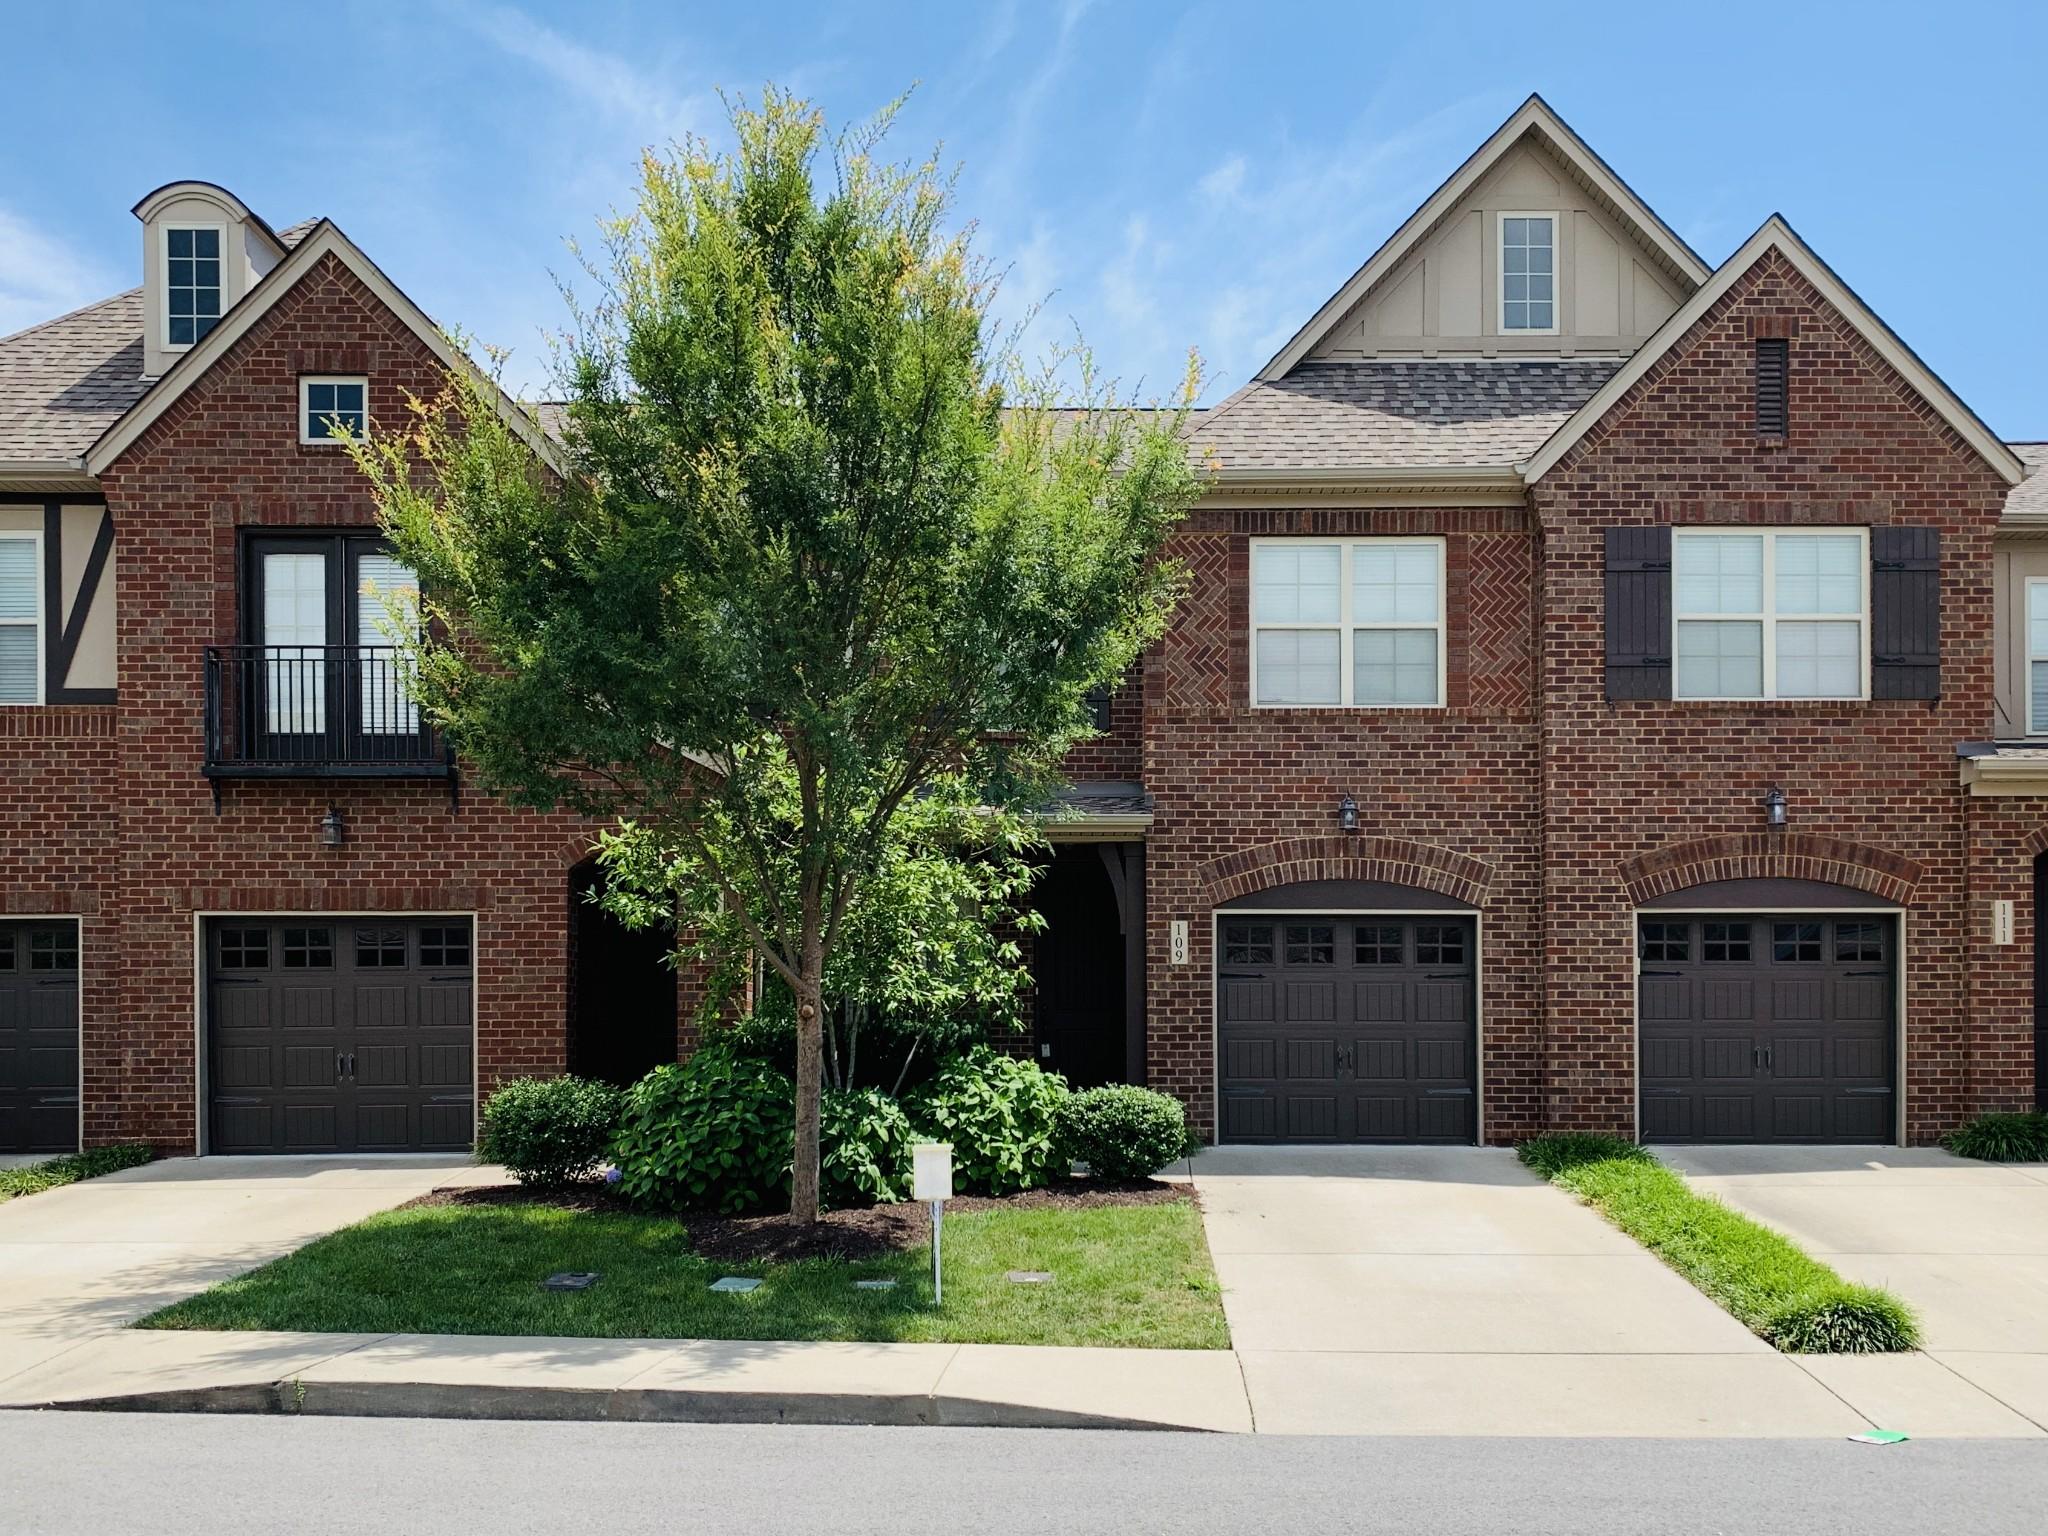 109 Ambassador Circle Pvt 17 Property Photo - Hendersonville, TN real estate listing